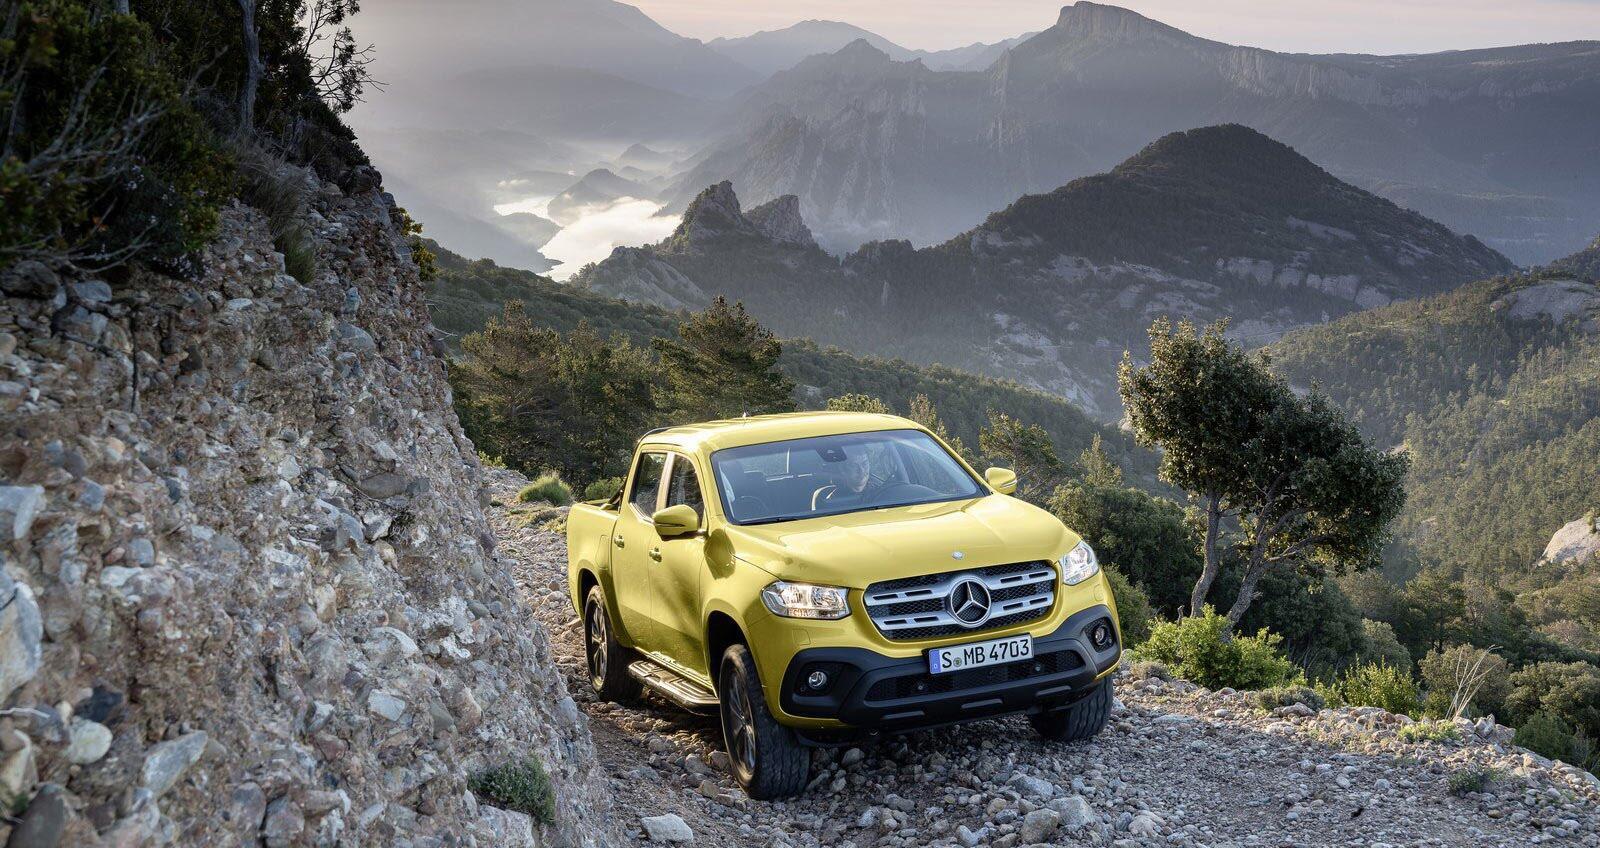 Ảnh chi tiết Mercedes-Benz X-Class - Hình 1